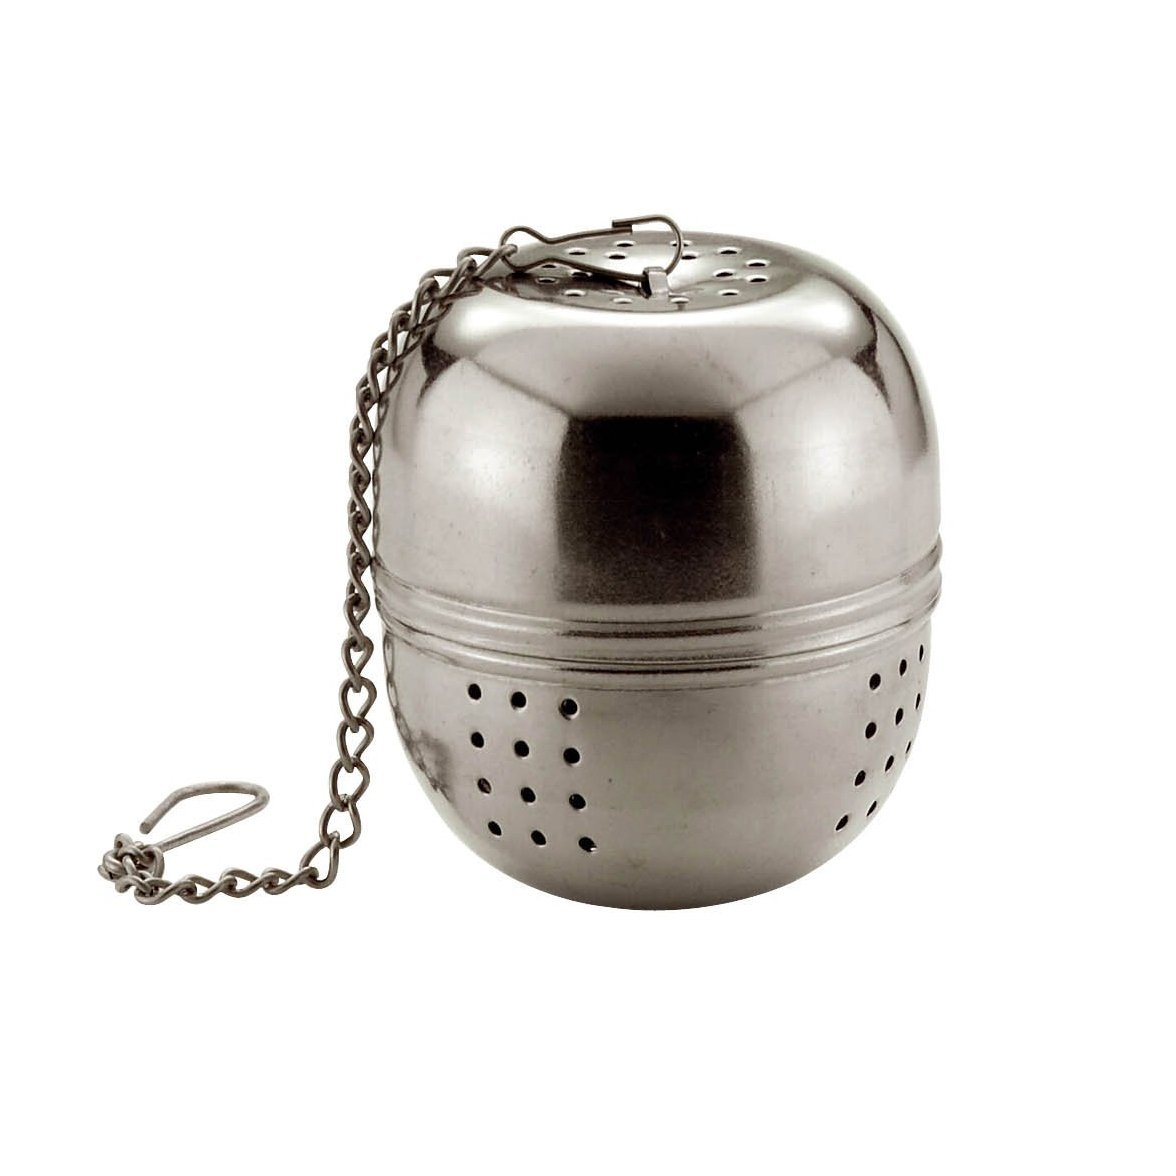 R TOOGOO TEA BALL STRAINER INFUSER INFUSE METAL STAINLESS STEEL